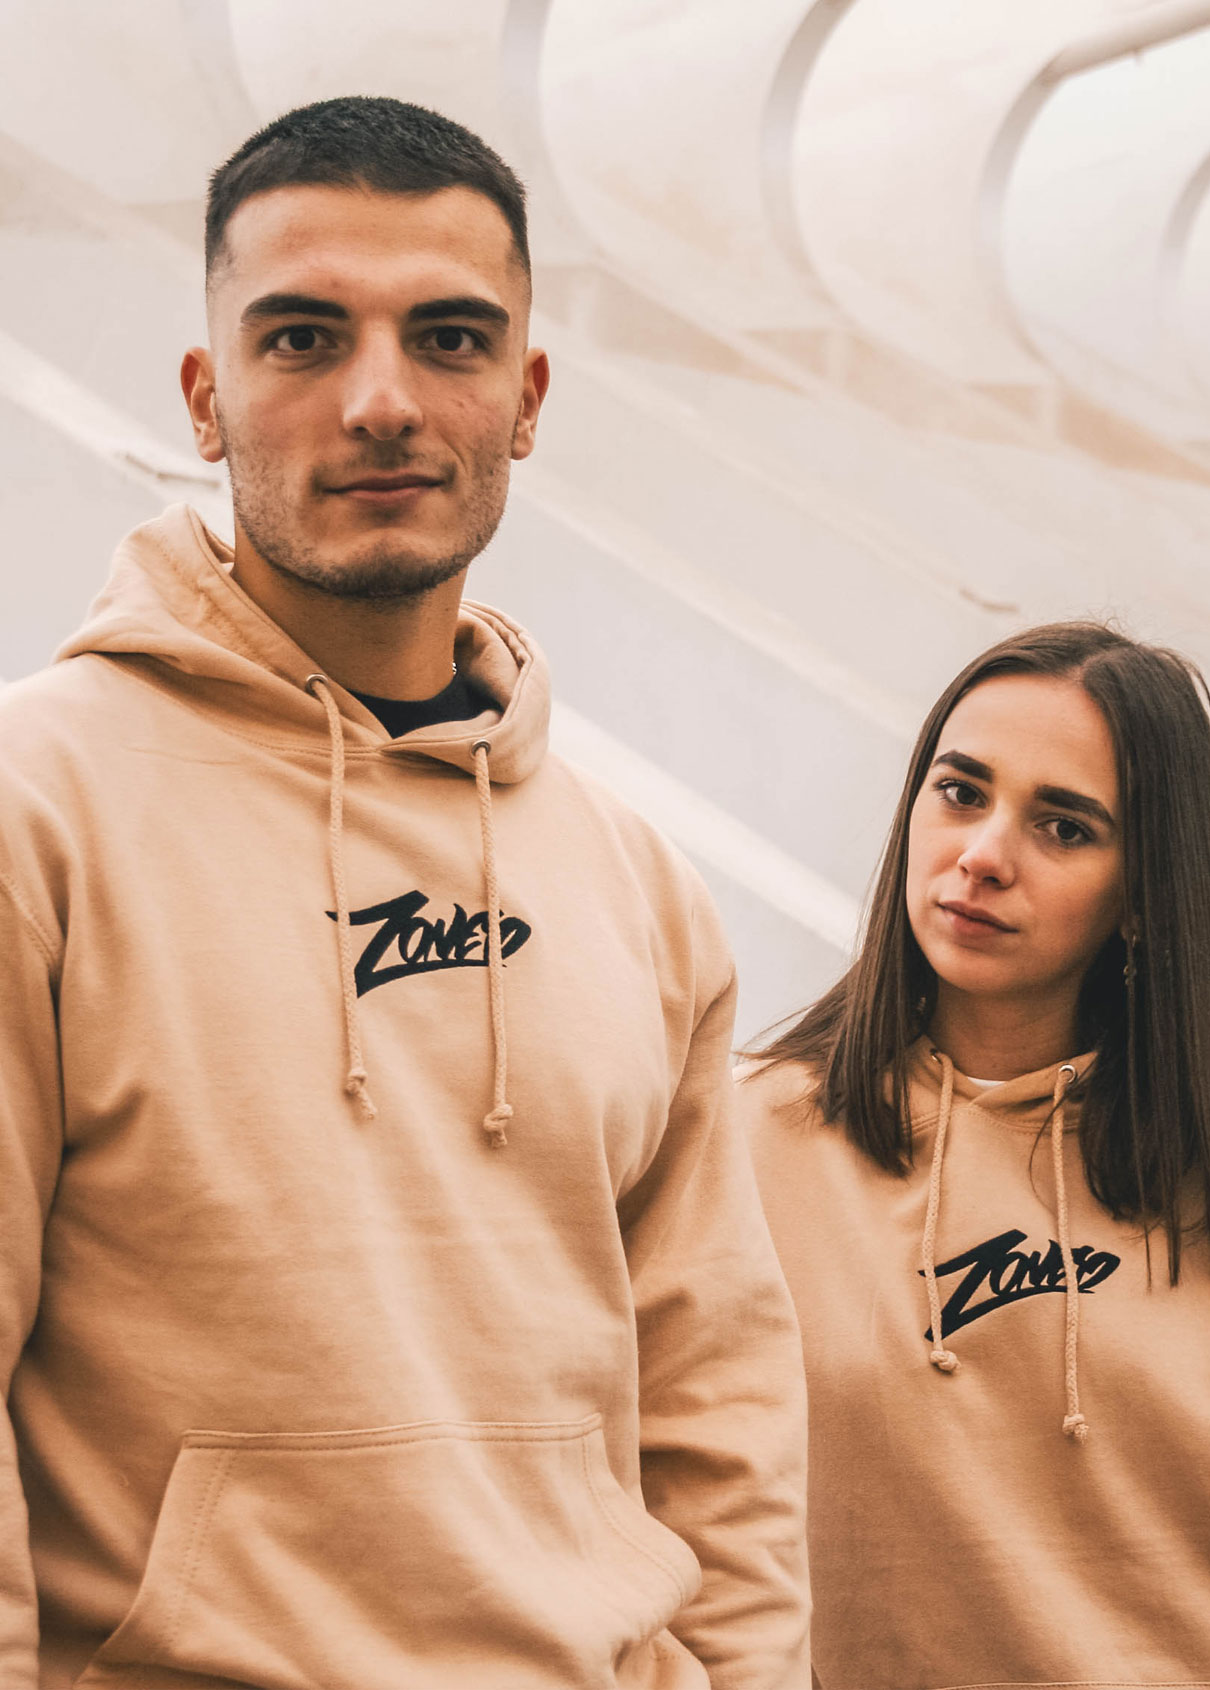 Zoned Clothing